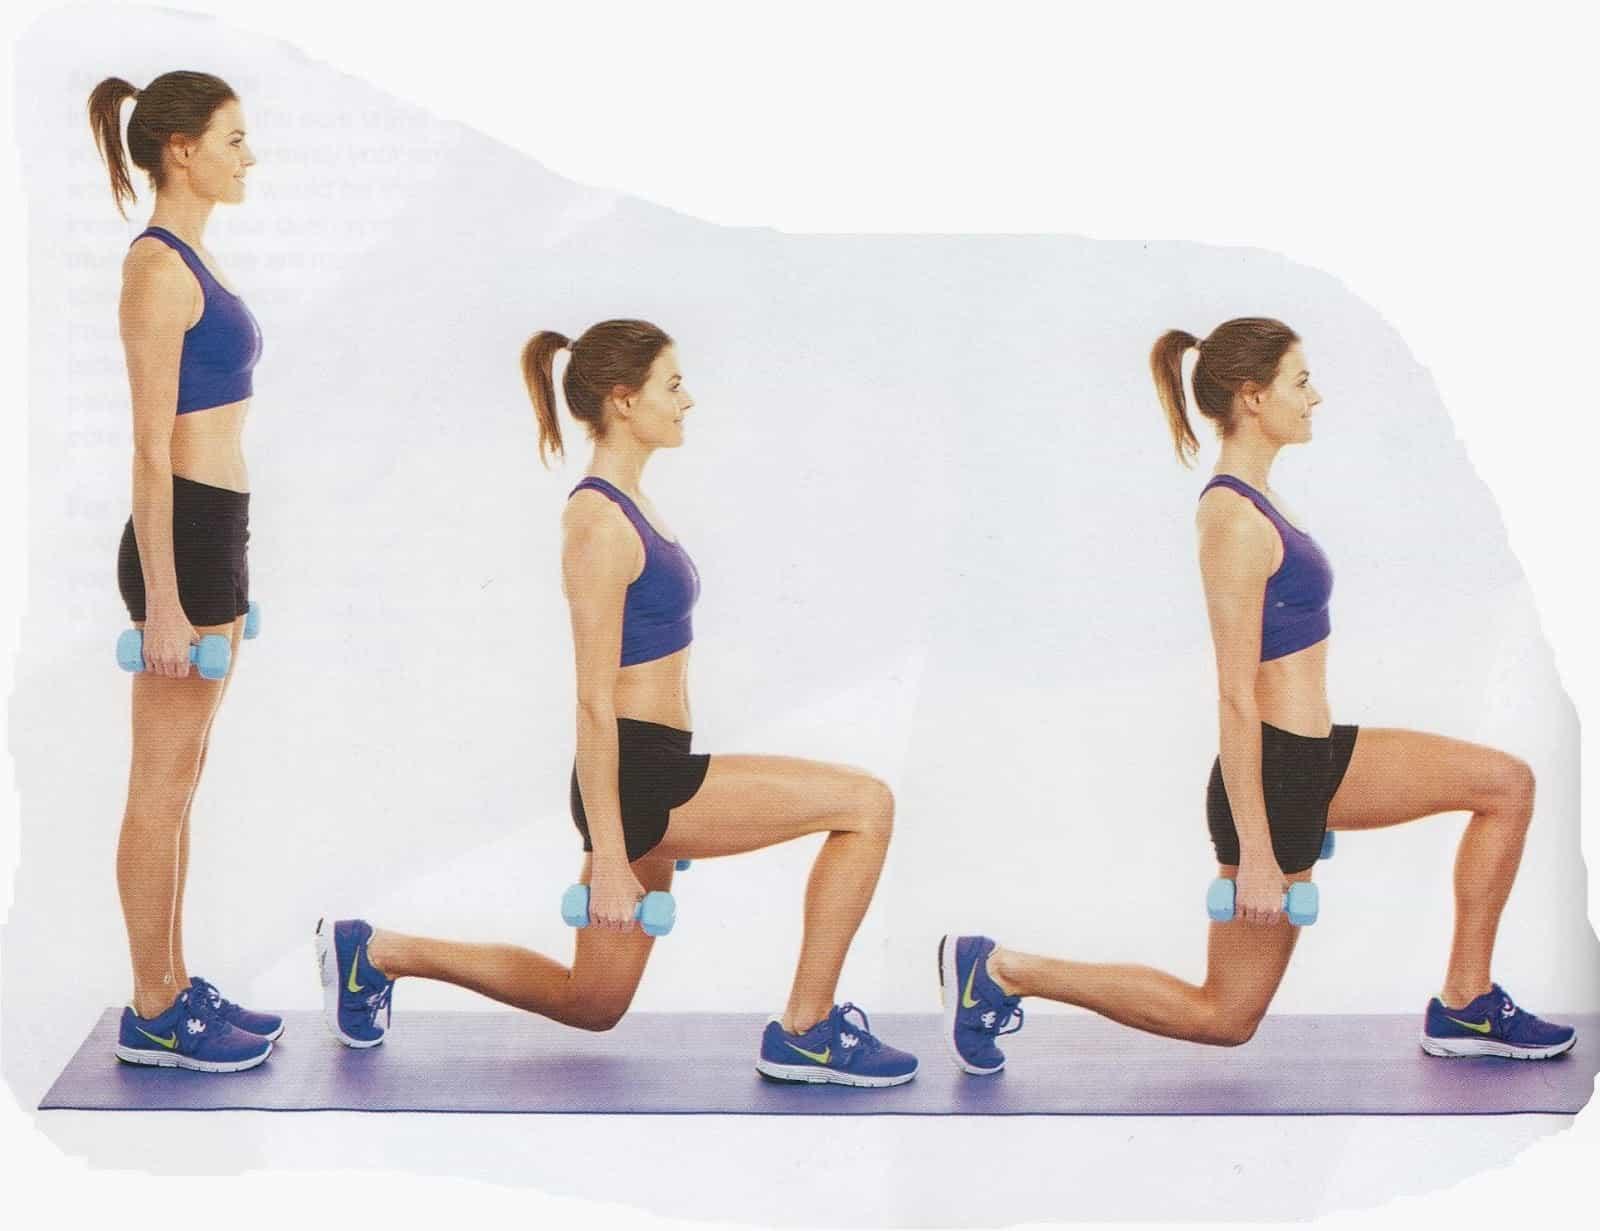 Reducir cadera